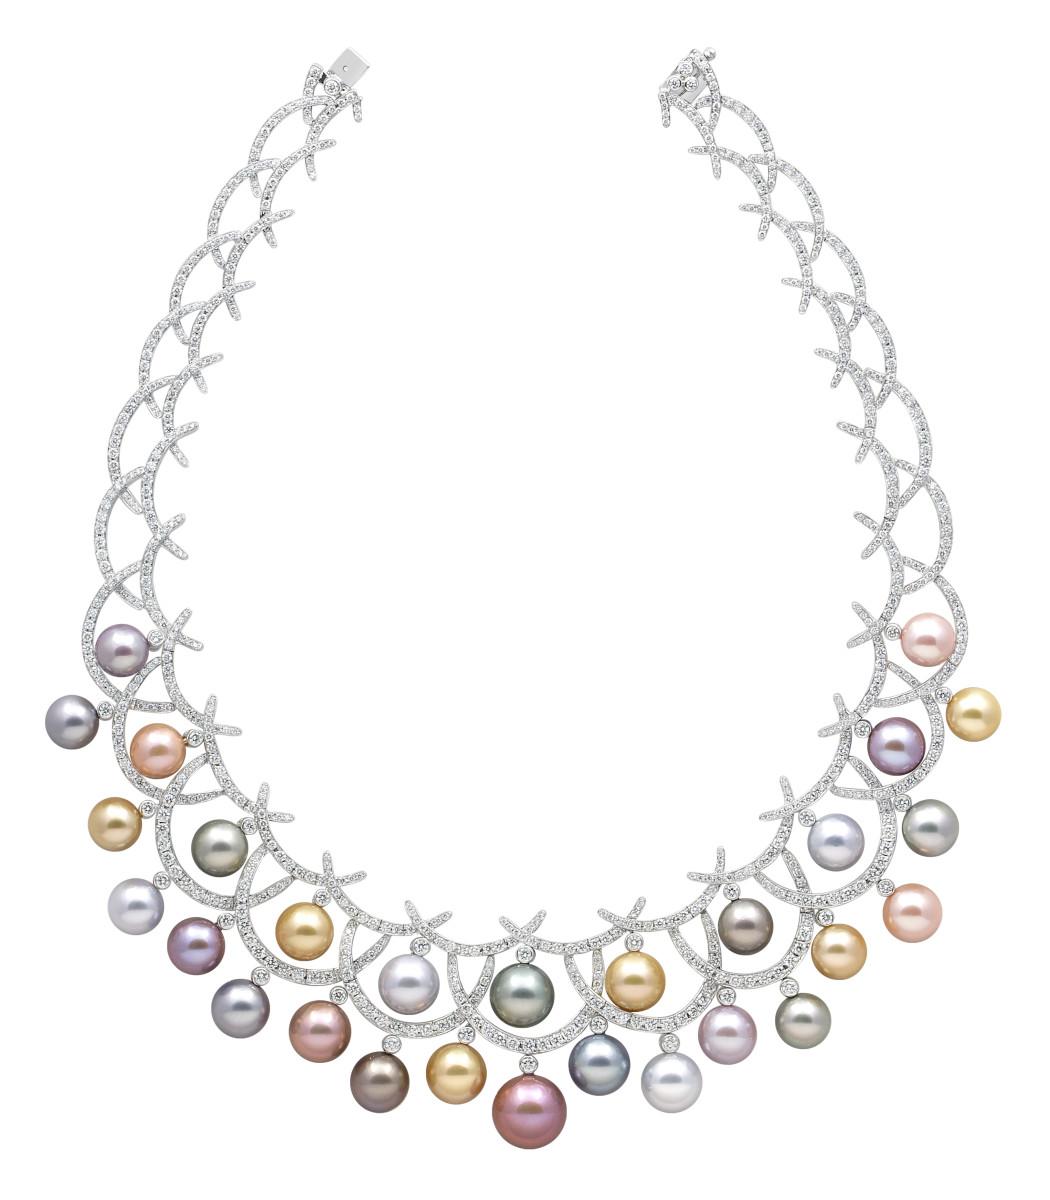 Yoko-London-Carnevale-pearl-necklace-JCK-prize-winner.jpg